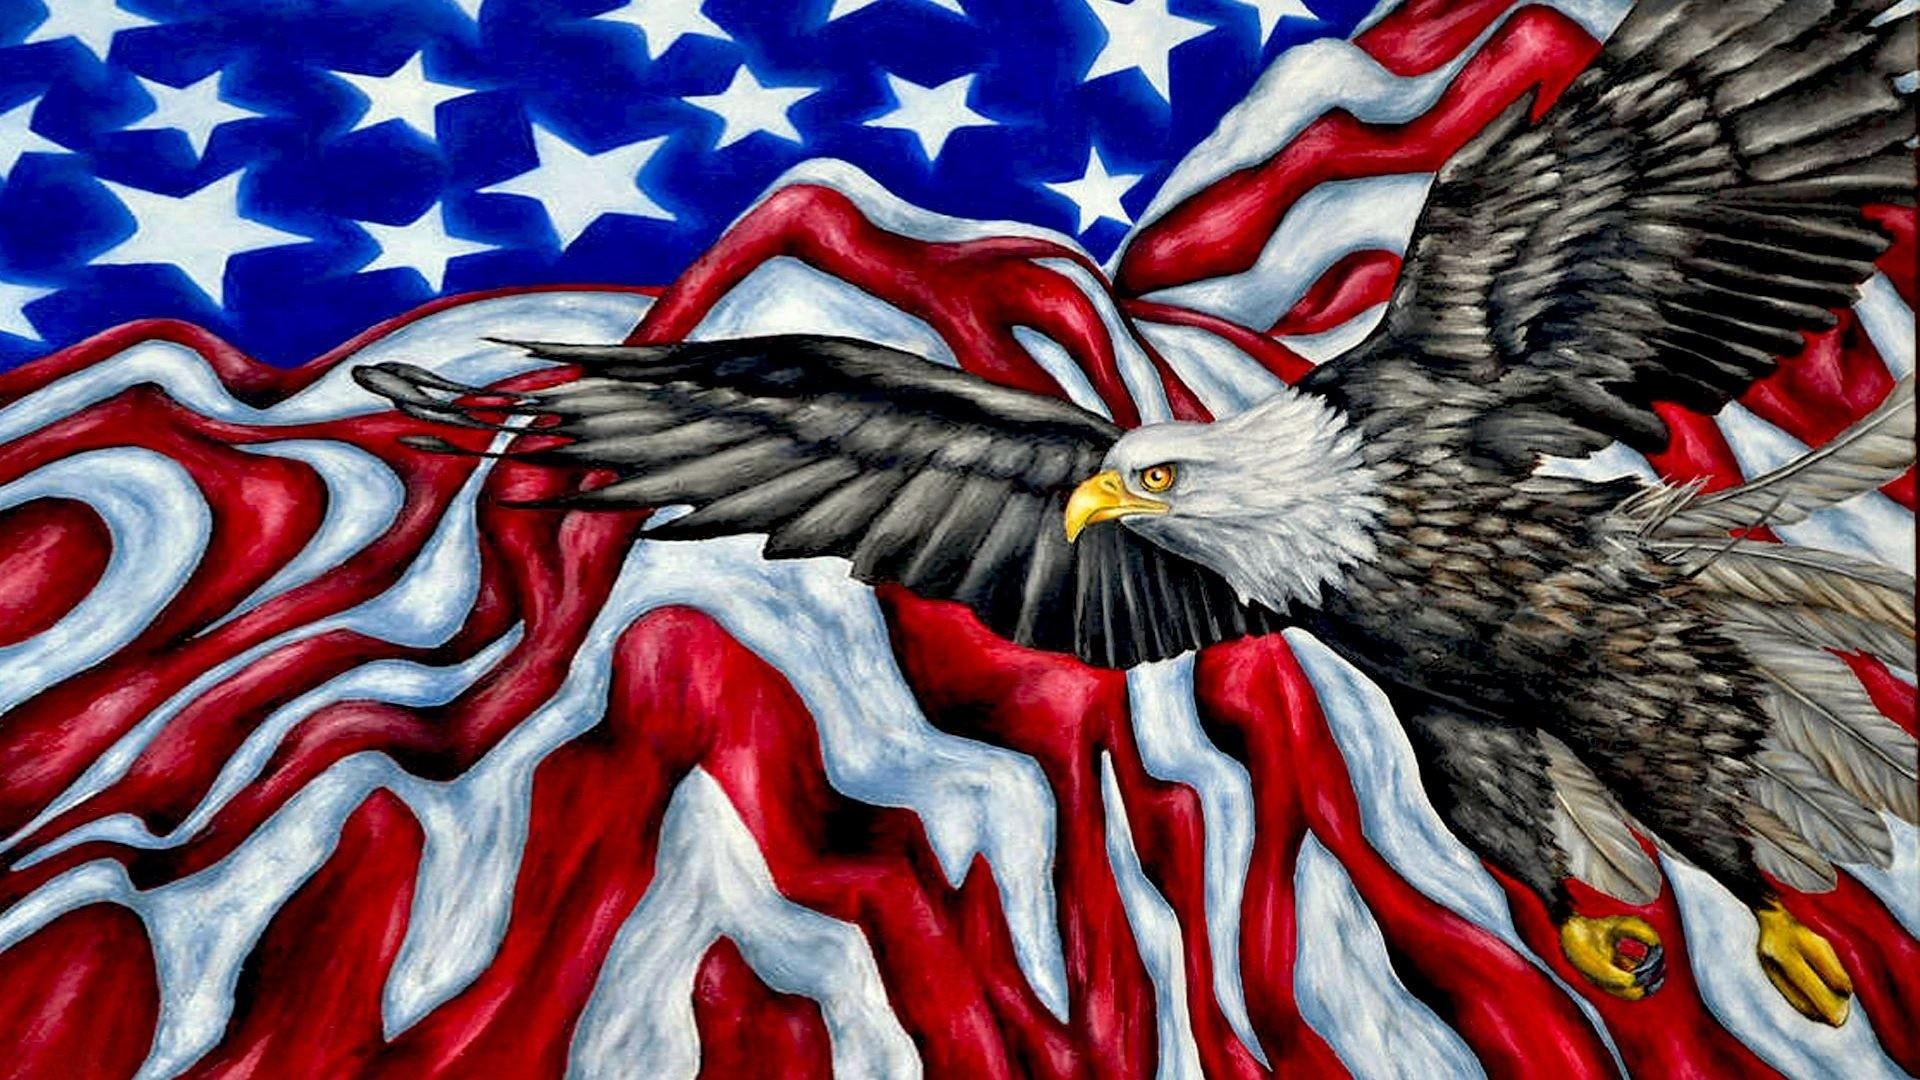 Patriotic Wallpaper theme